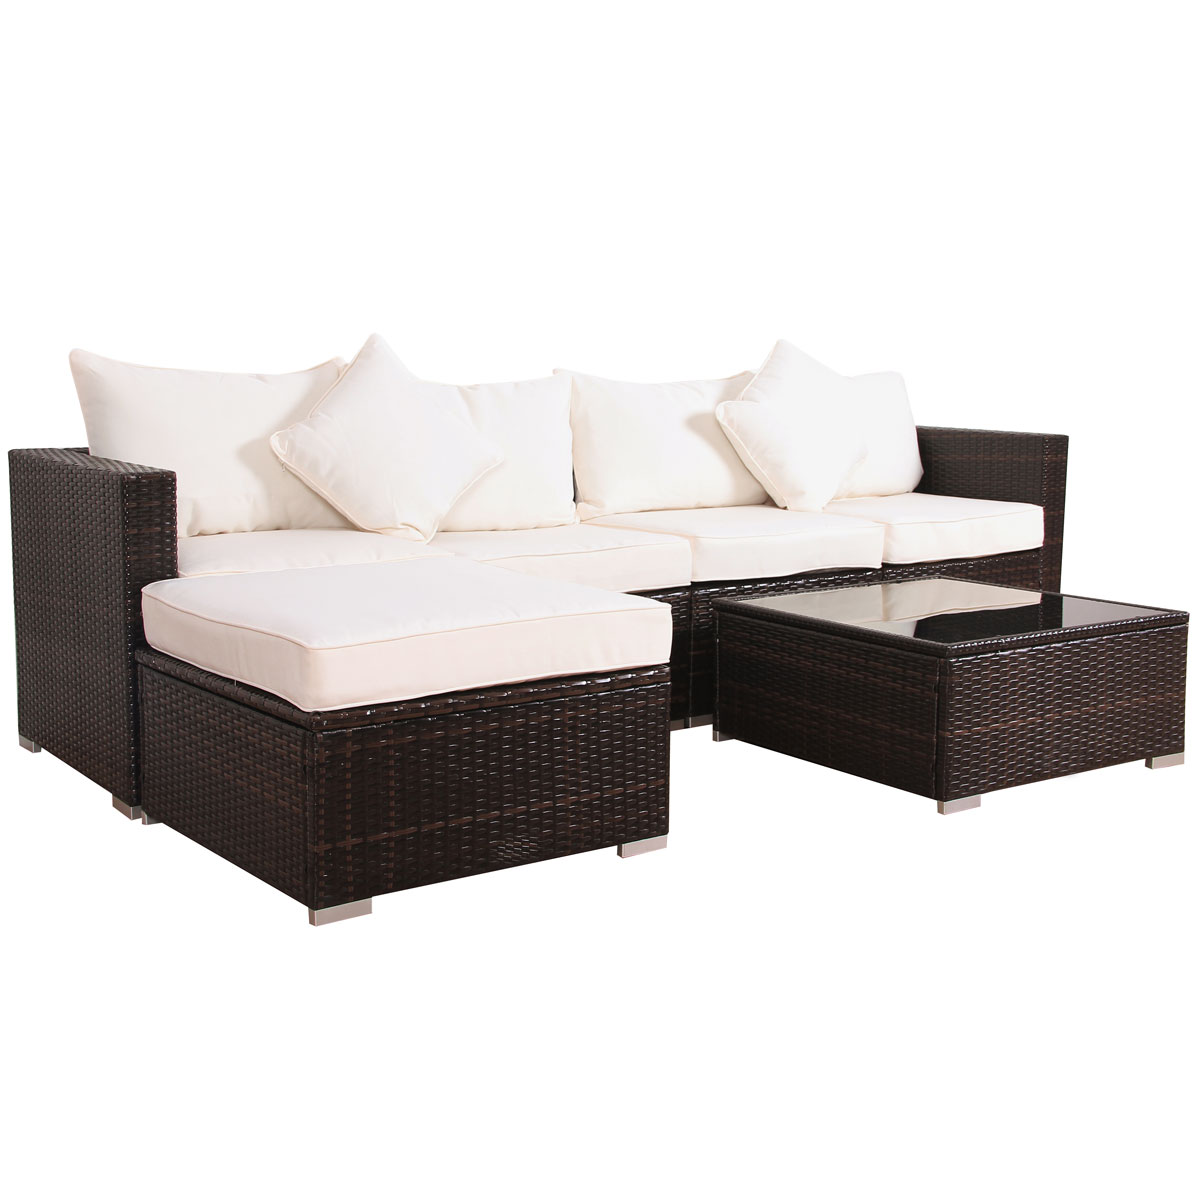 Balkonmobel Couch Garten Lounge Ecksofa Gartenmobel Set Polyrattan